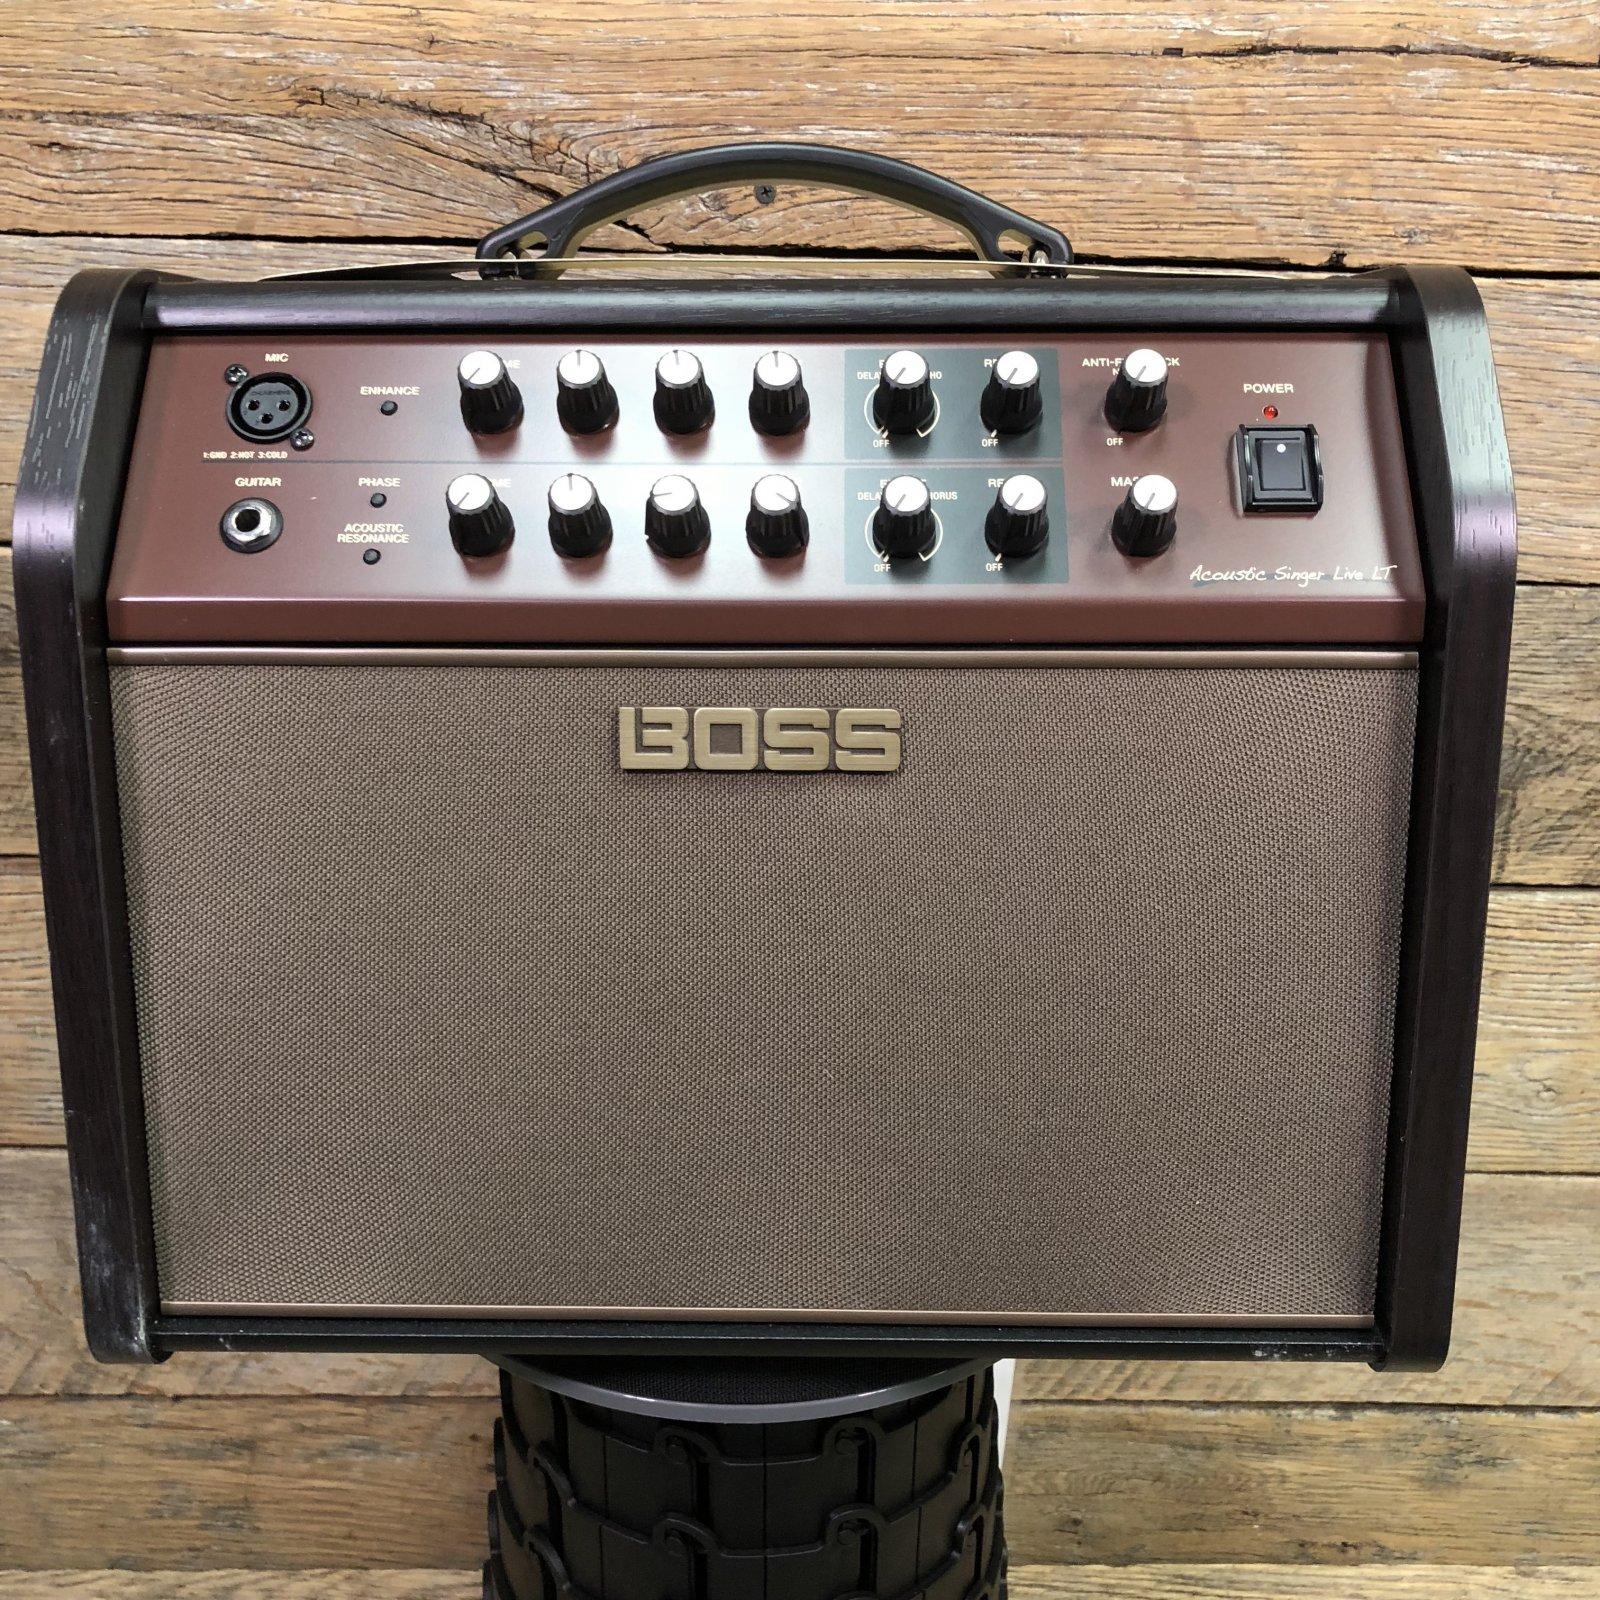 Boss ACS-LIVE Lite